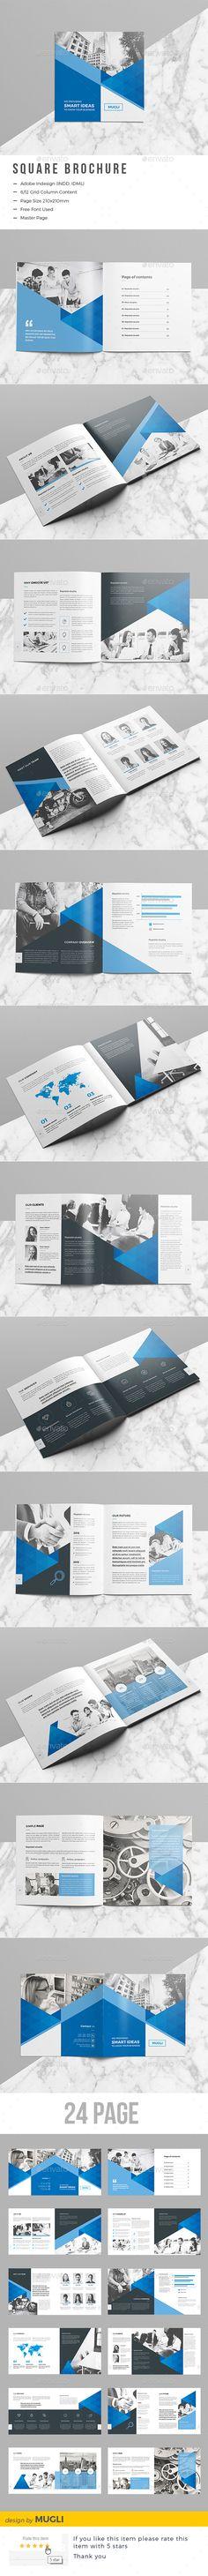 Square #Brochure - #Corporate Brochures Download here: https://graphicriver.net/item/square-brochure/19576642?ref=alena994